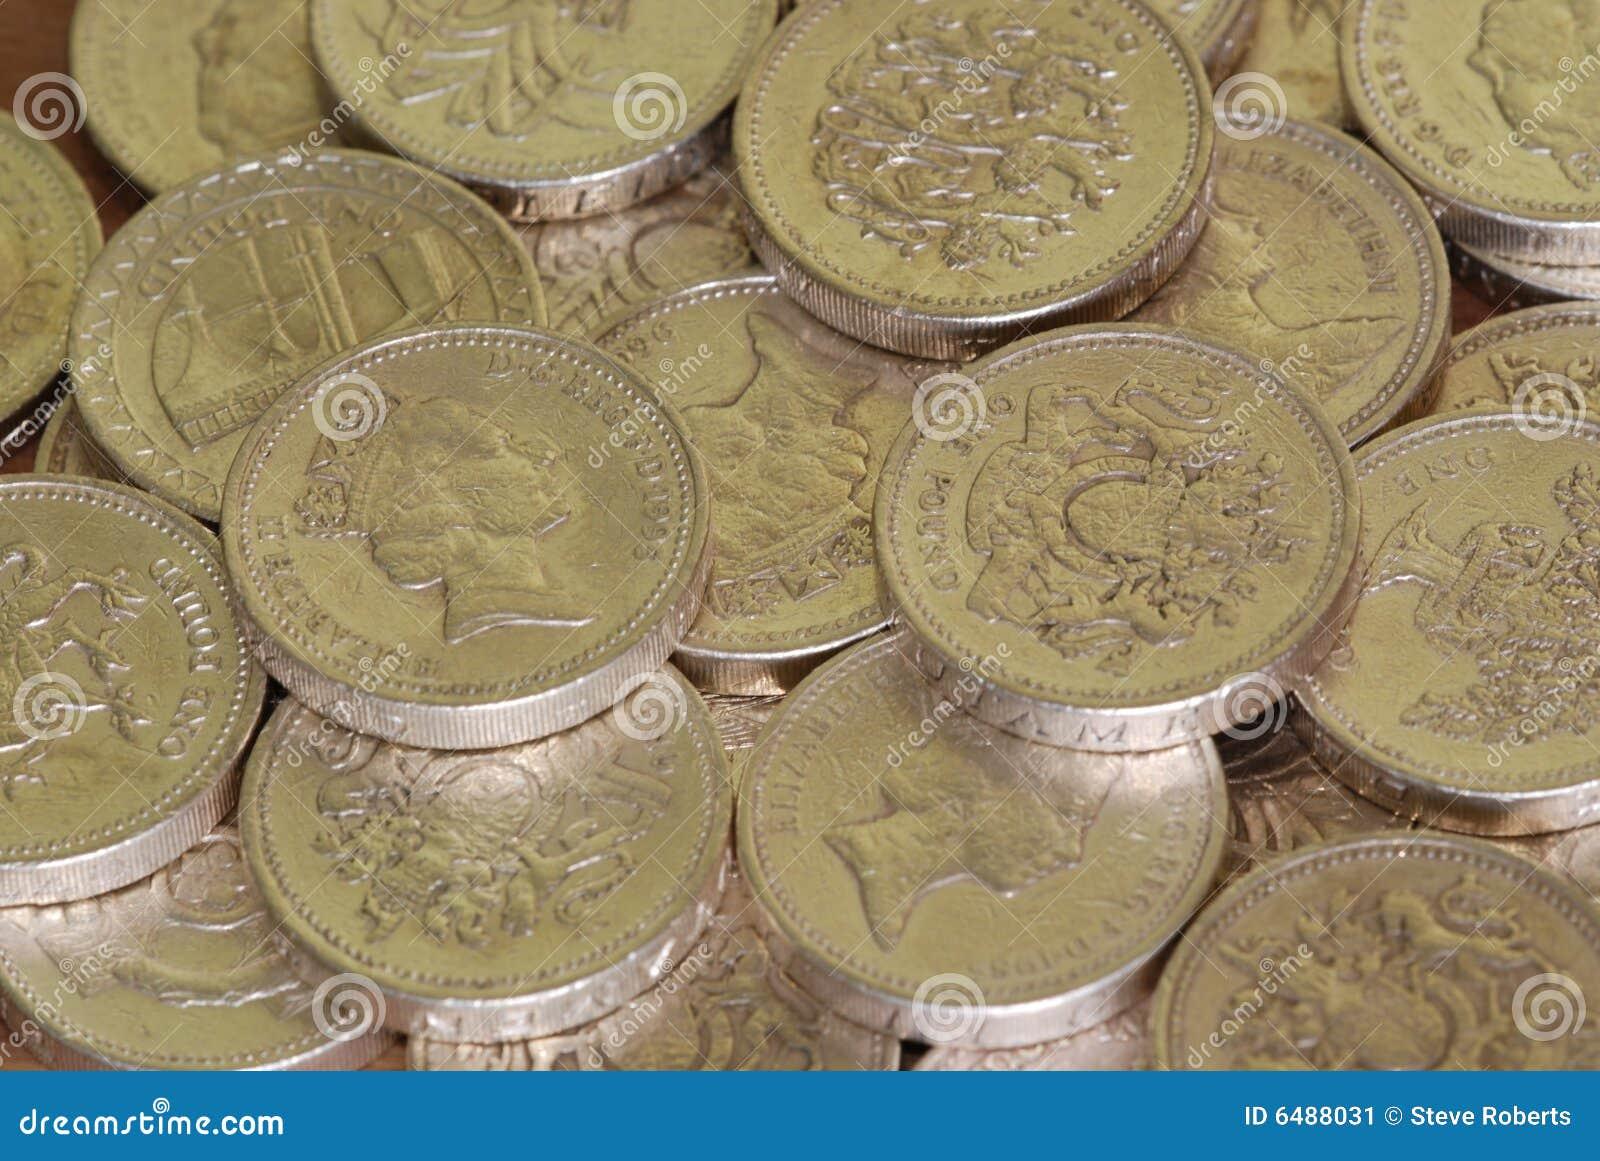 Stapel van Engelse pondmuntstukken